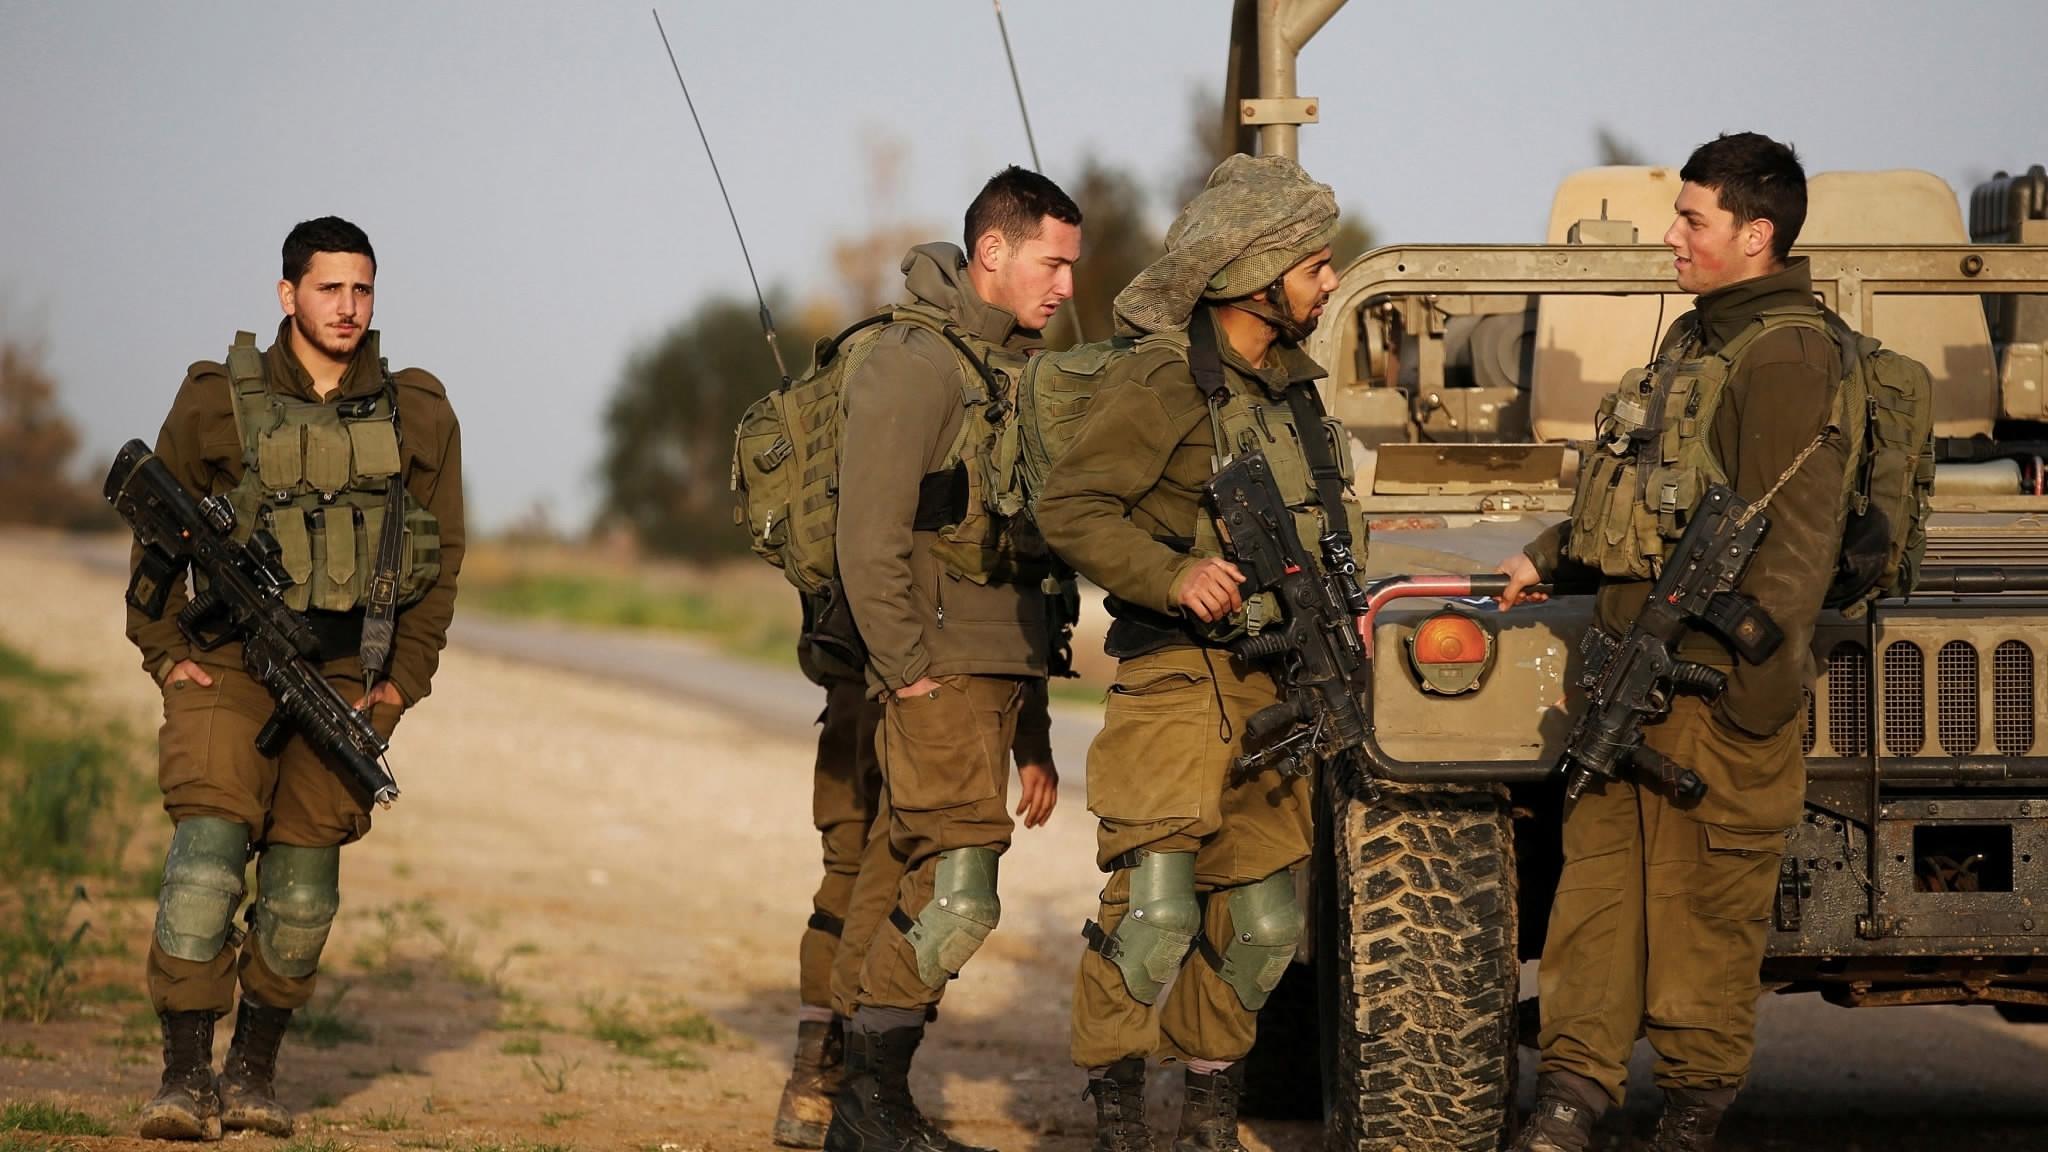 Israeli troops, Palestinian militants exchange fire near border